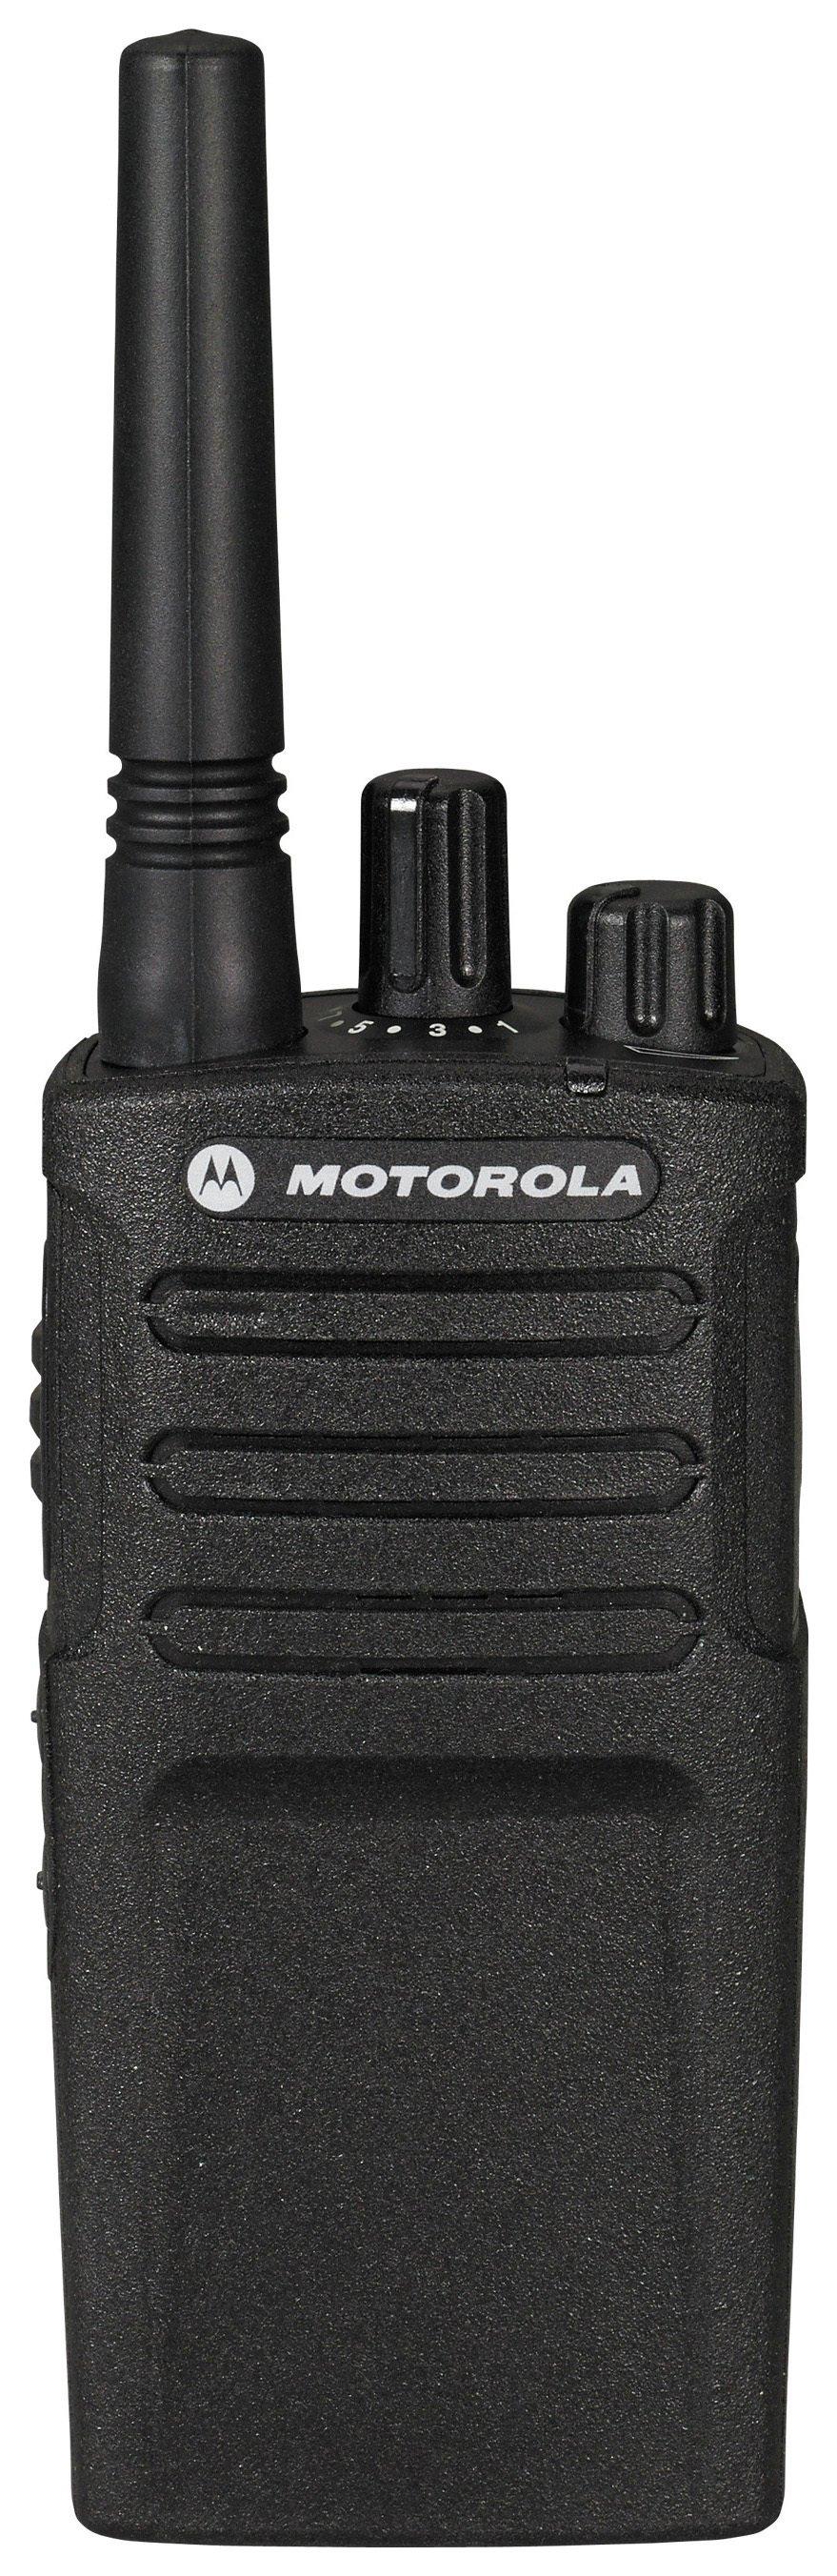 Motorola XT420 2 Way Radio - No Charger. lowest price